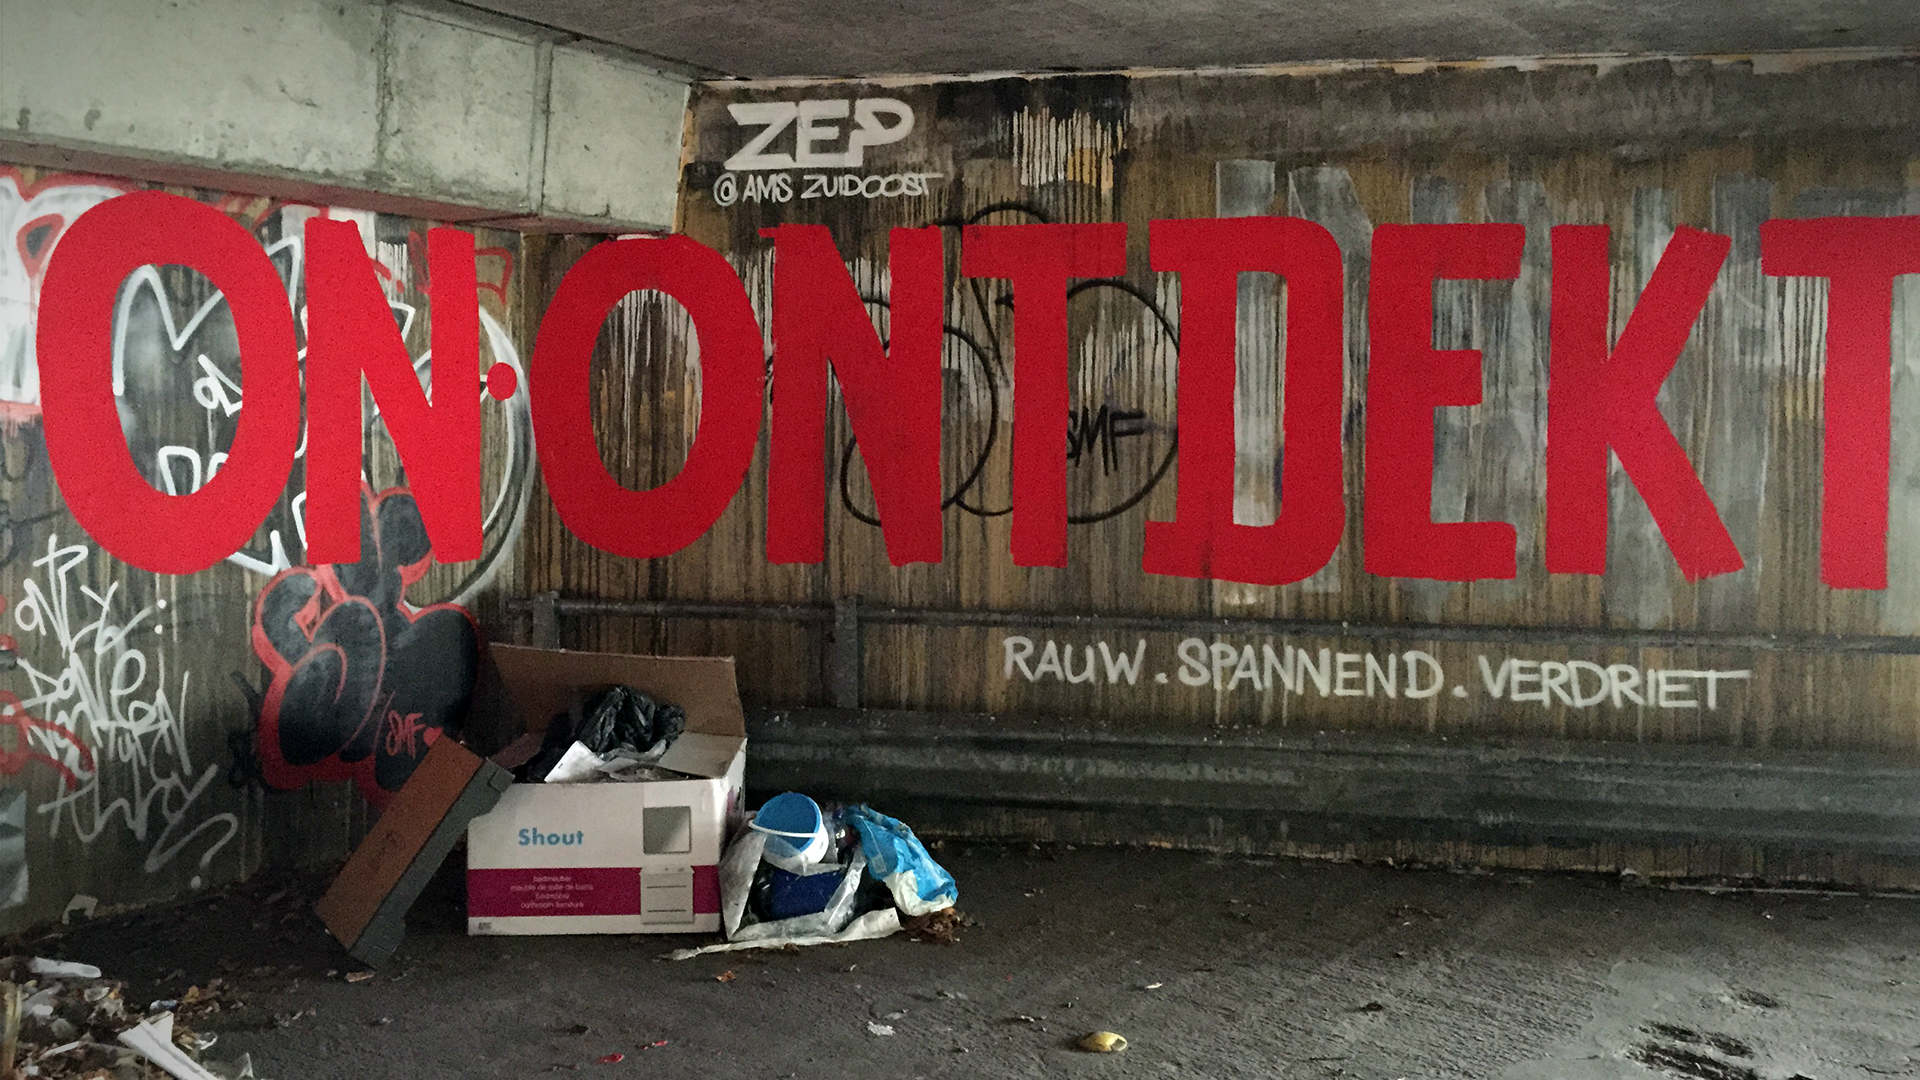 ZEP Theaterproducties. Case. Visuals Branding & identity, communicatie strategie, concept, creative- & art direction, design. Sham Ramessar